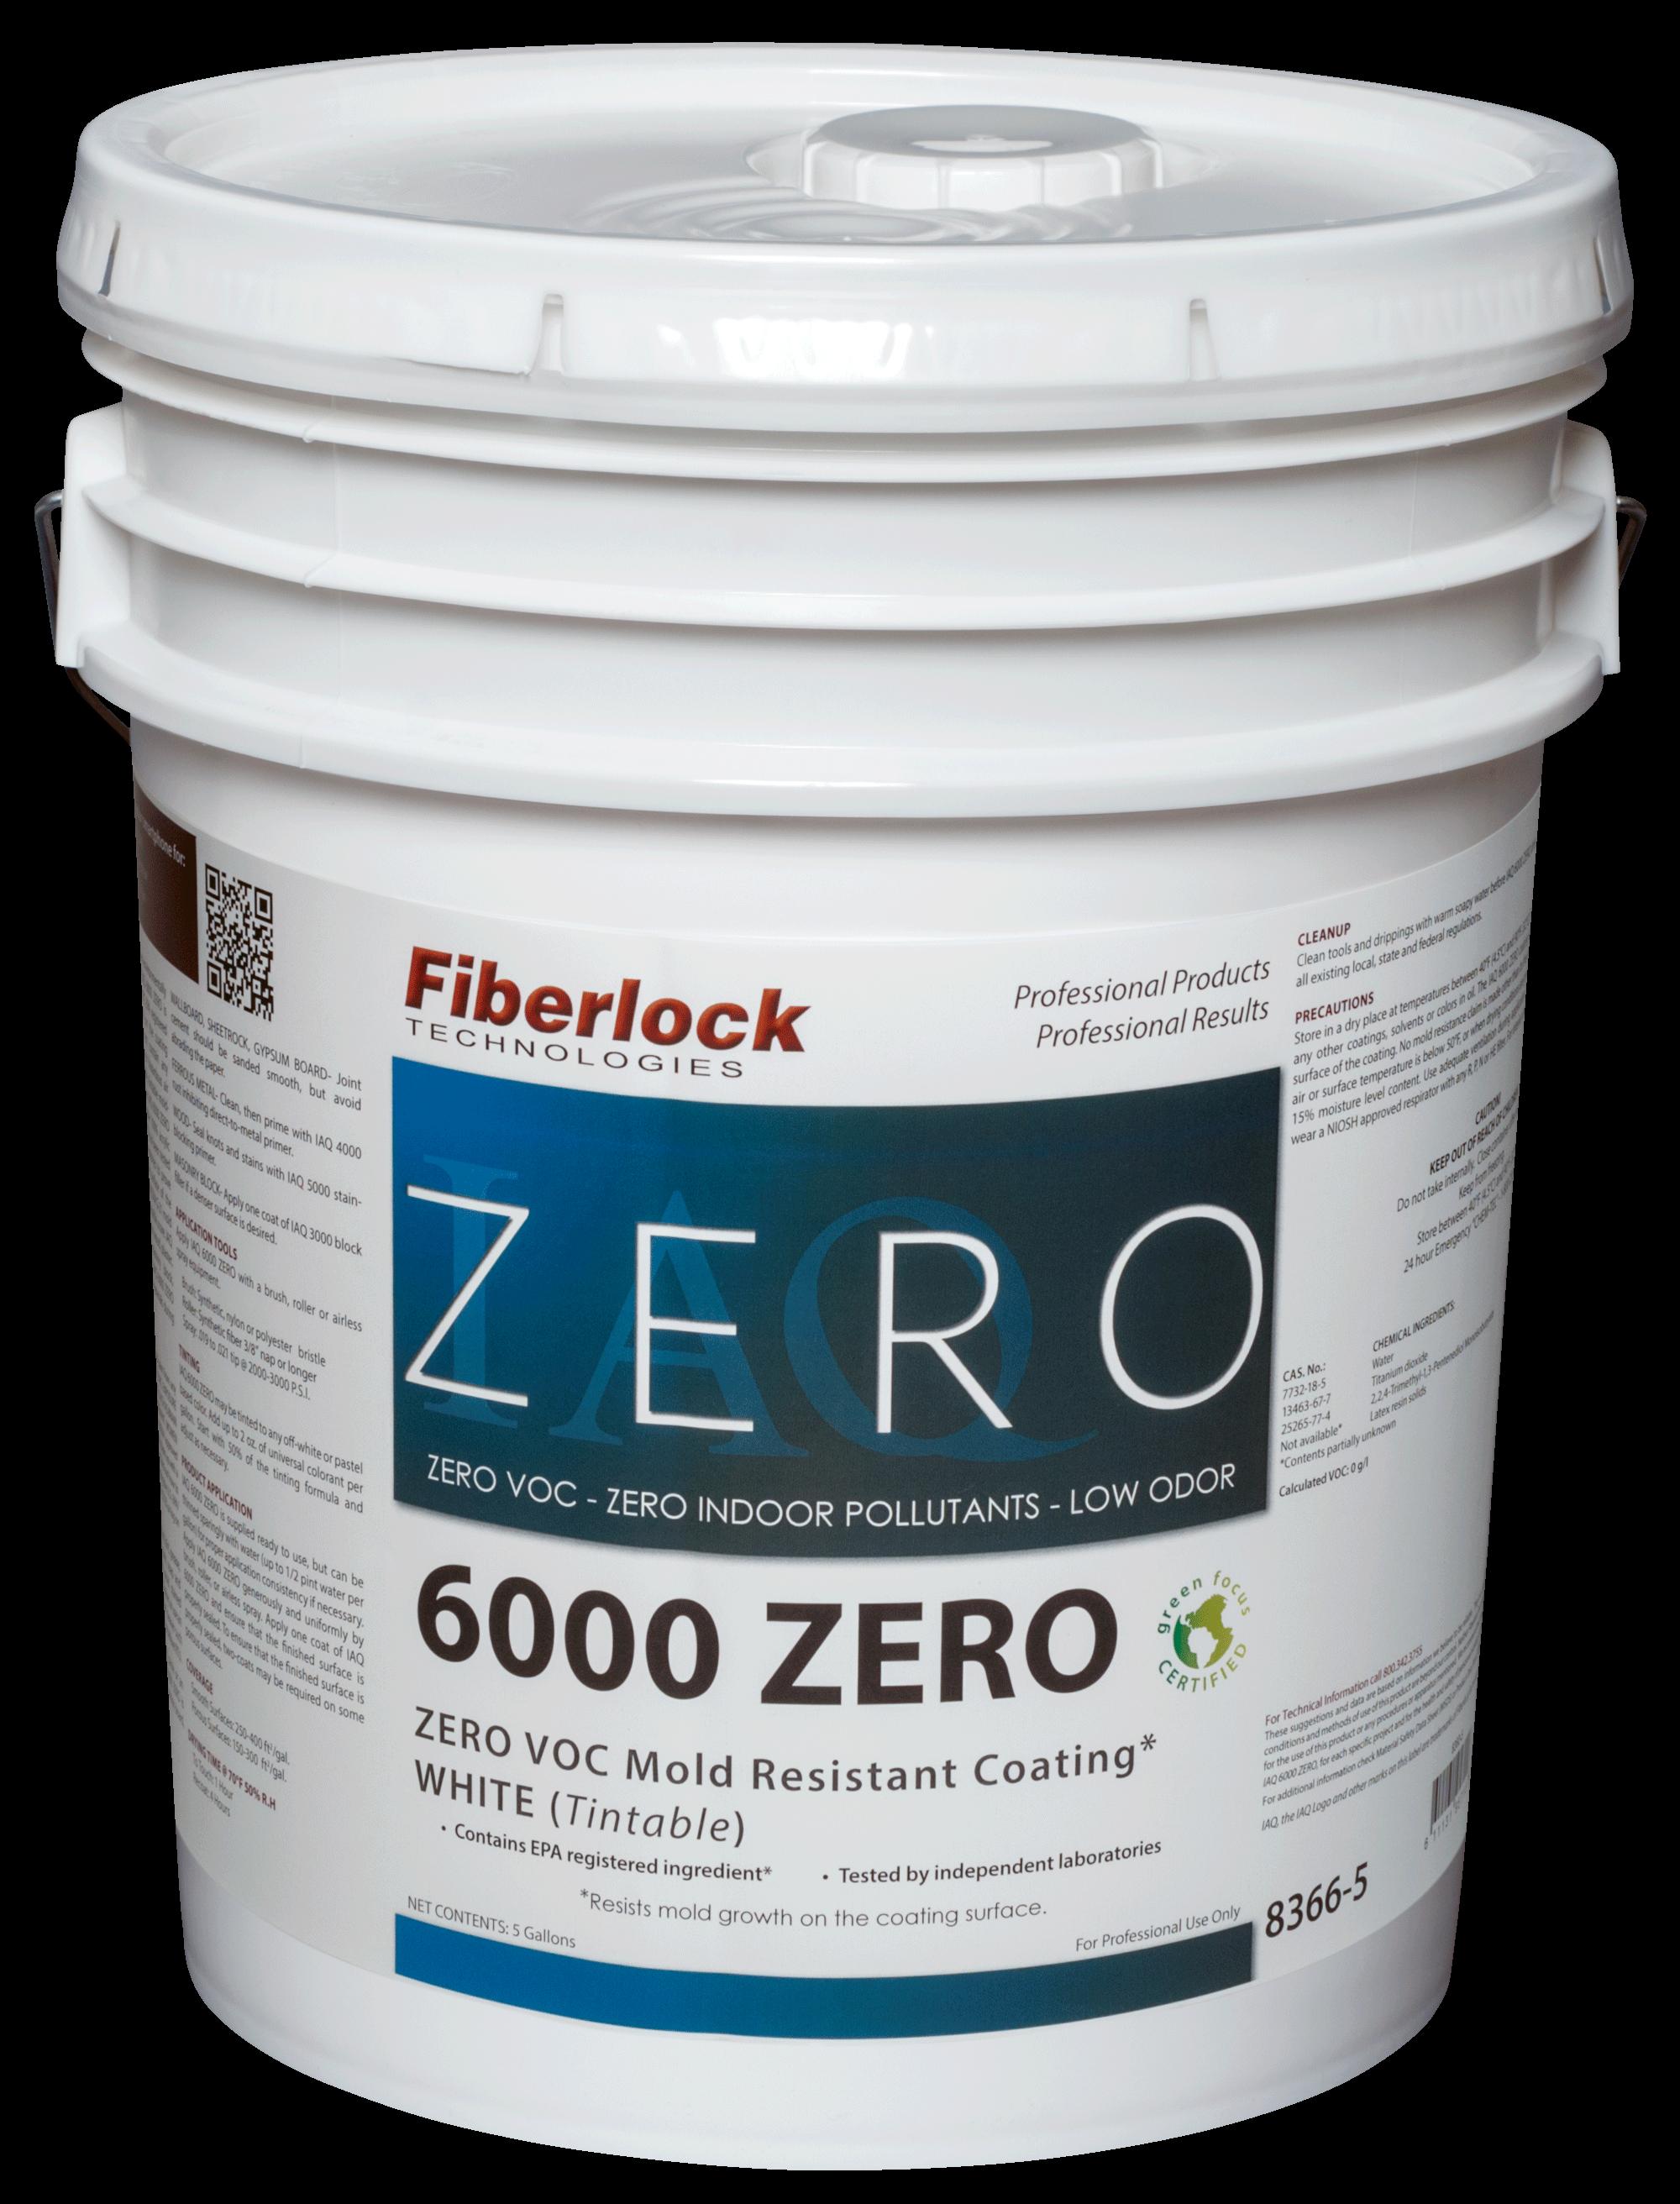 Fiberlock IAQ 6000 ZERO Coating/WHITE FINISH (5 gal.)